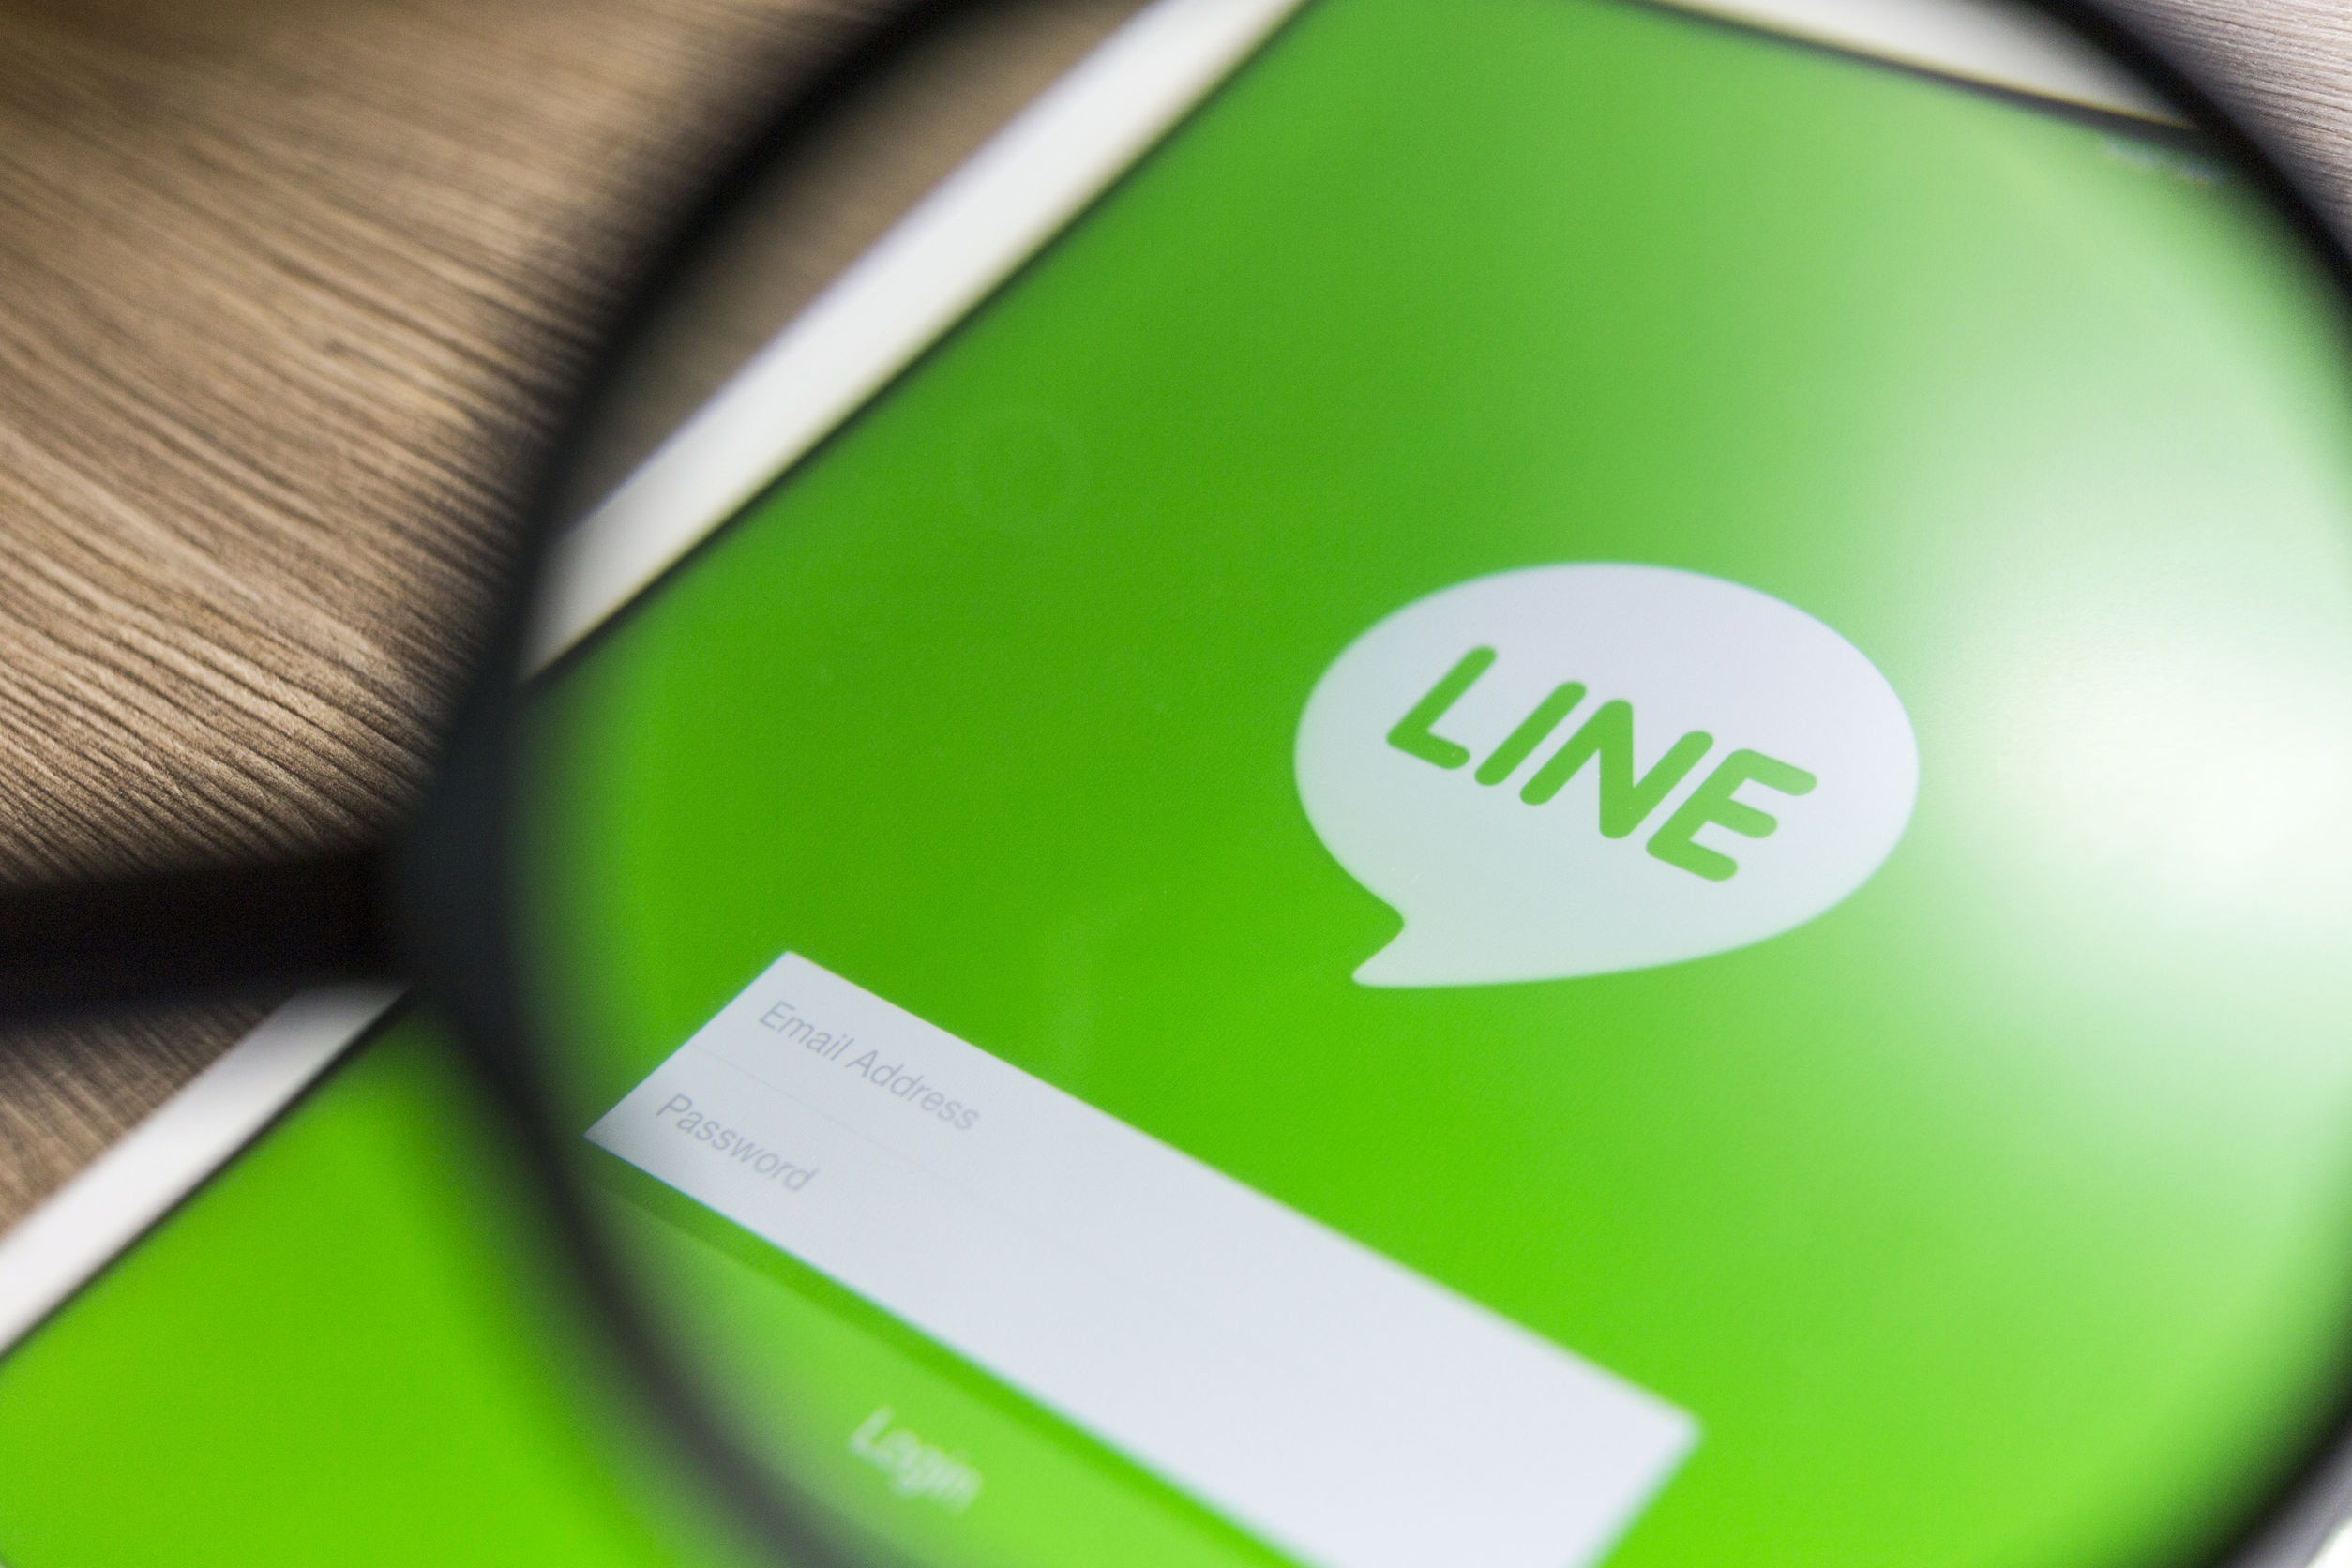 软银打算把 Yahoo! JAPAN 和 LINE 撮合到一起